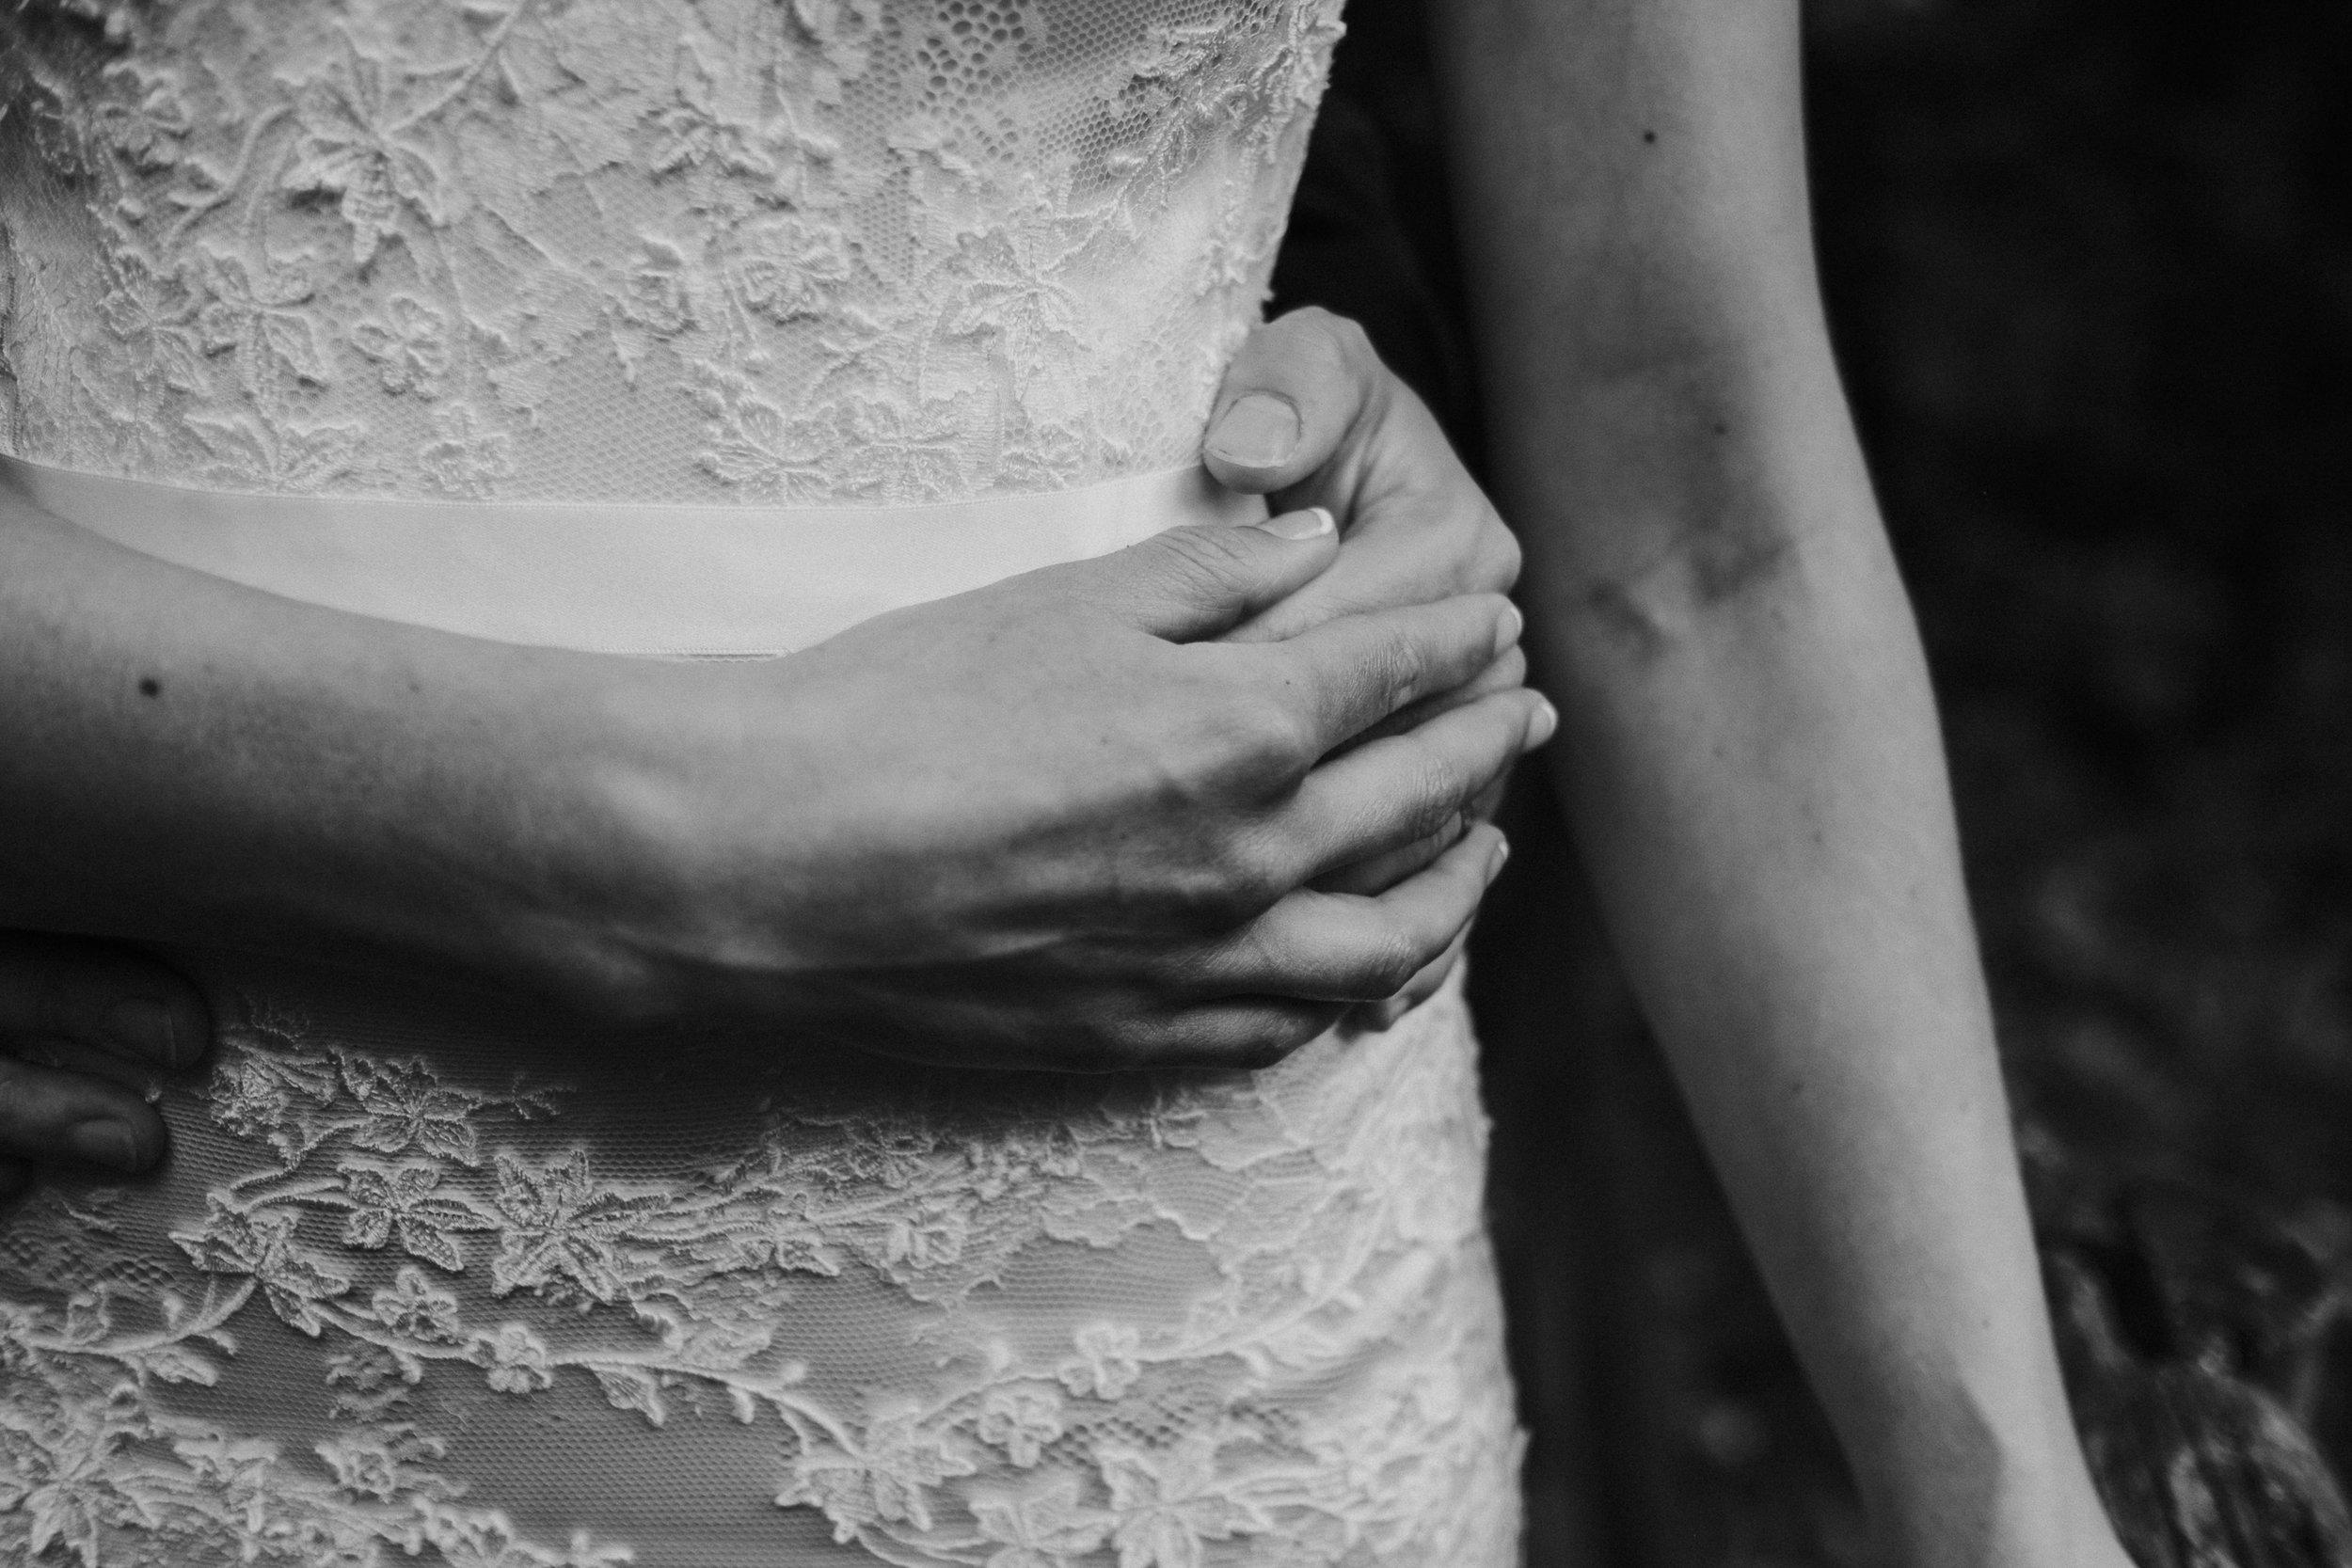 53 Norwood farm wedding photography joanna nicole3.jpg